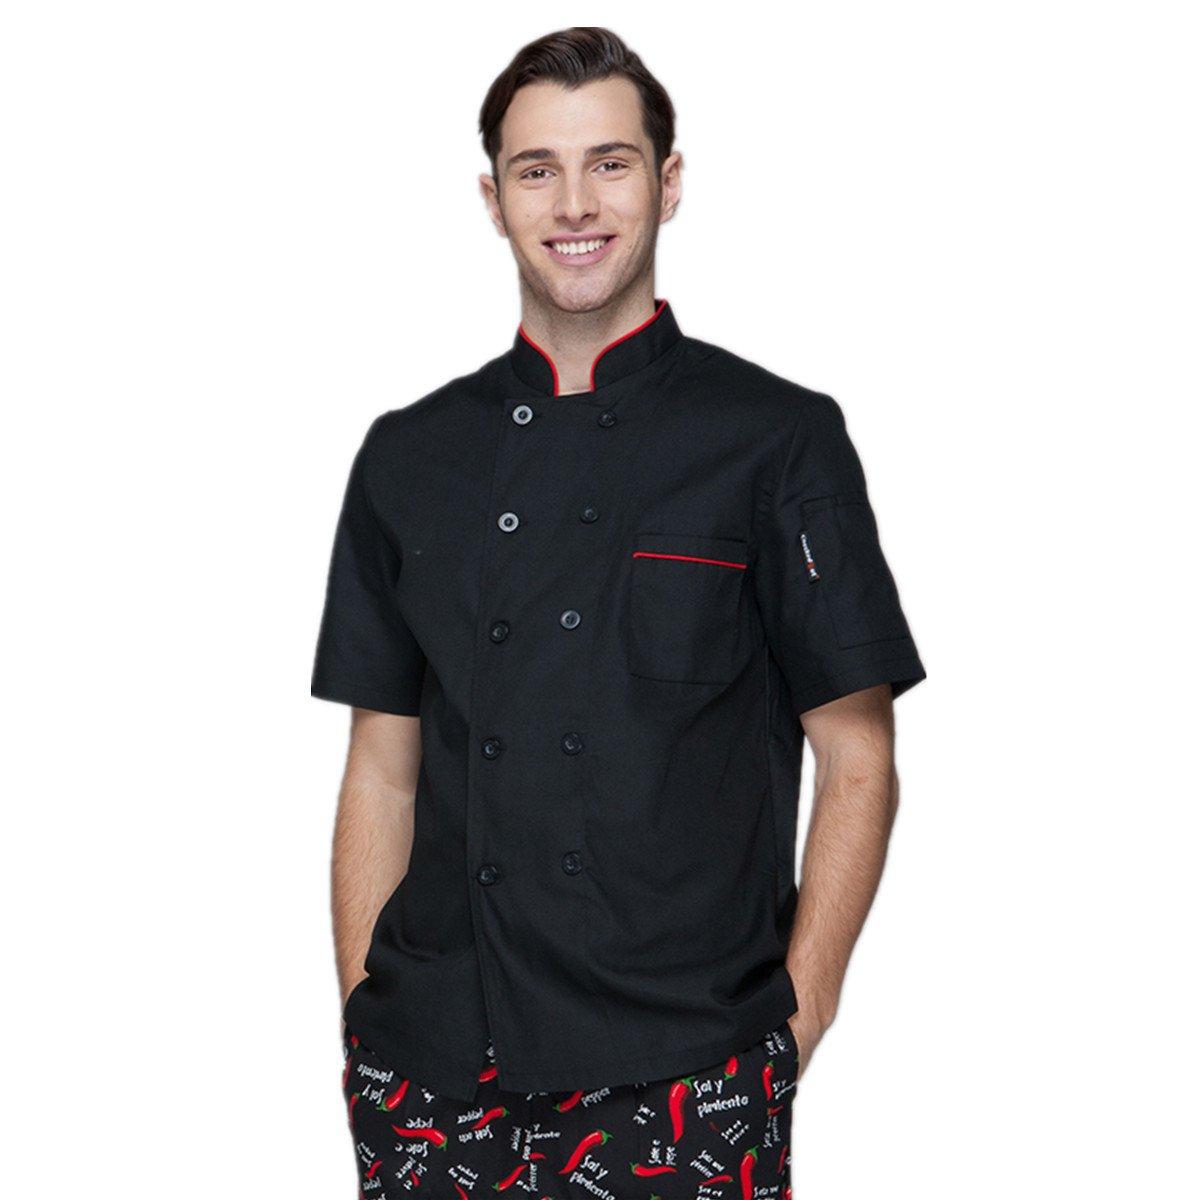 XINFU Chef's Short Sleeve Summer Uniform Comfortable and Wear Chef Coat Restaurant Kitchen Chef Jacket